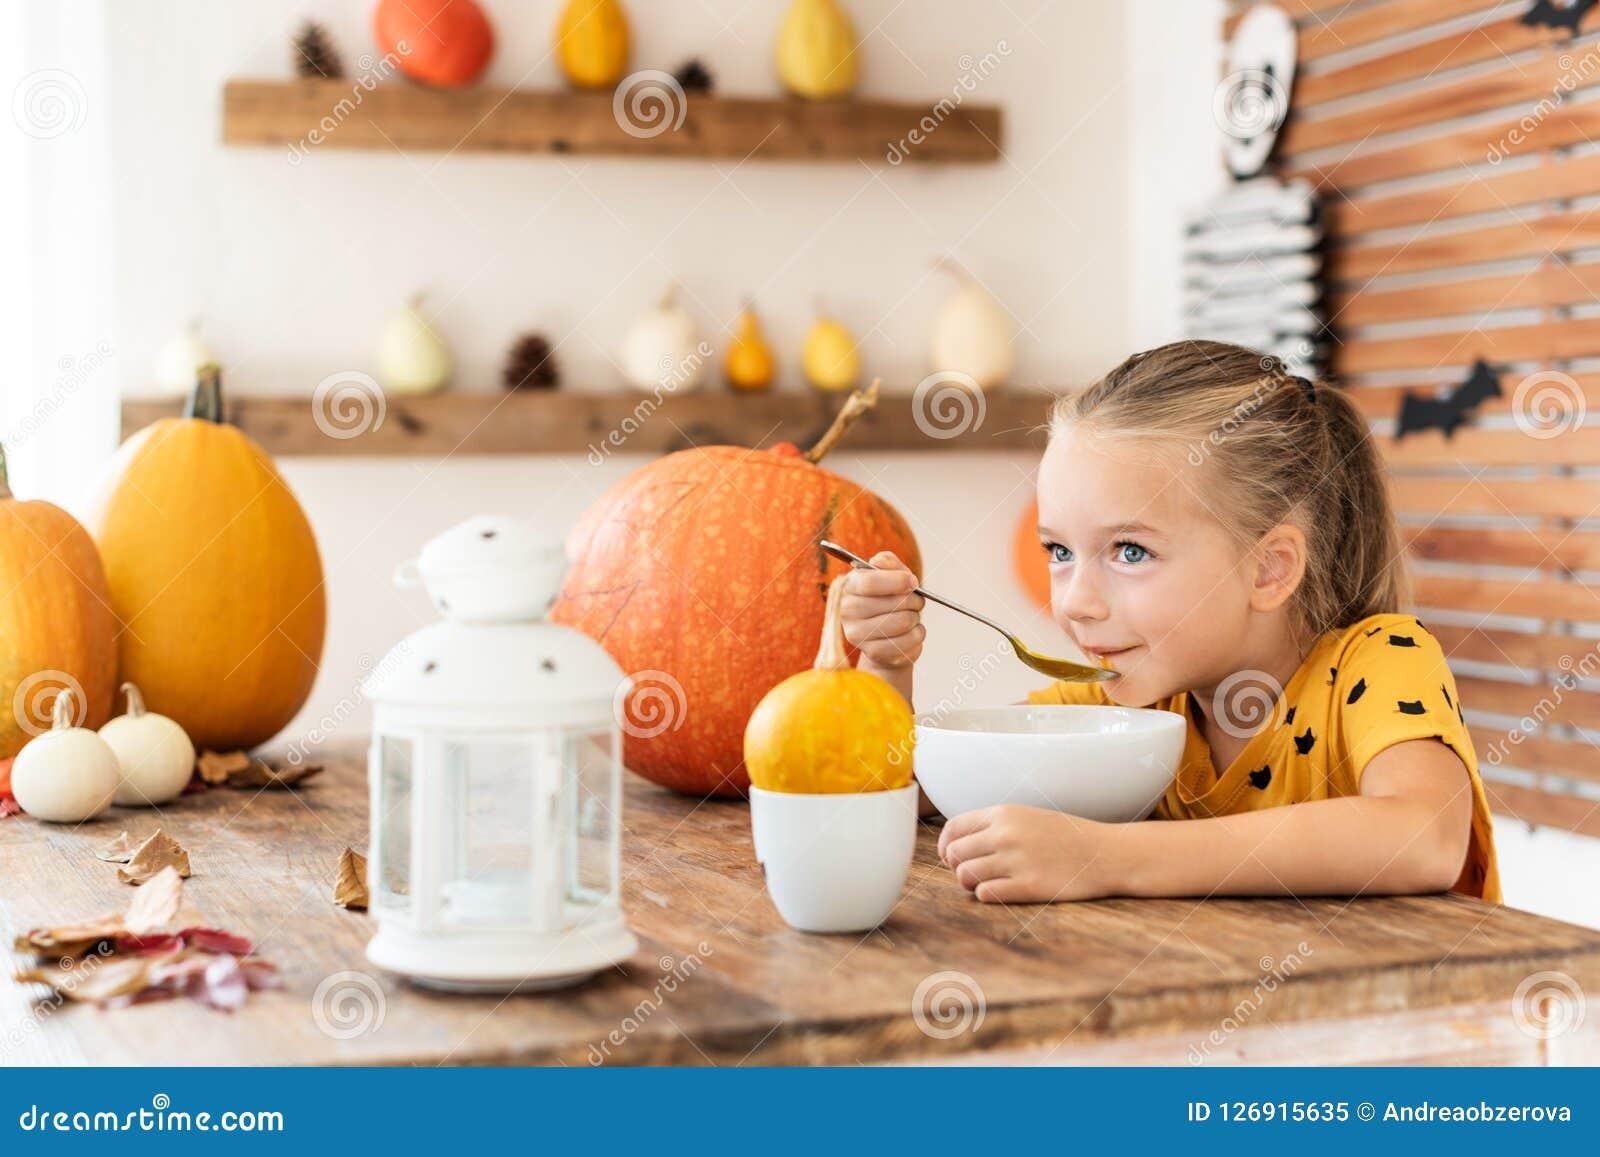 Cute little girl eating pumpkin soup in Halloween decorated dinning room. Autumn season comfort food.